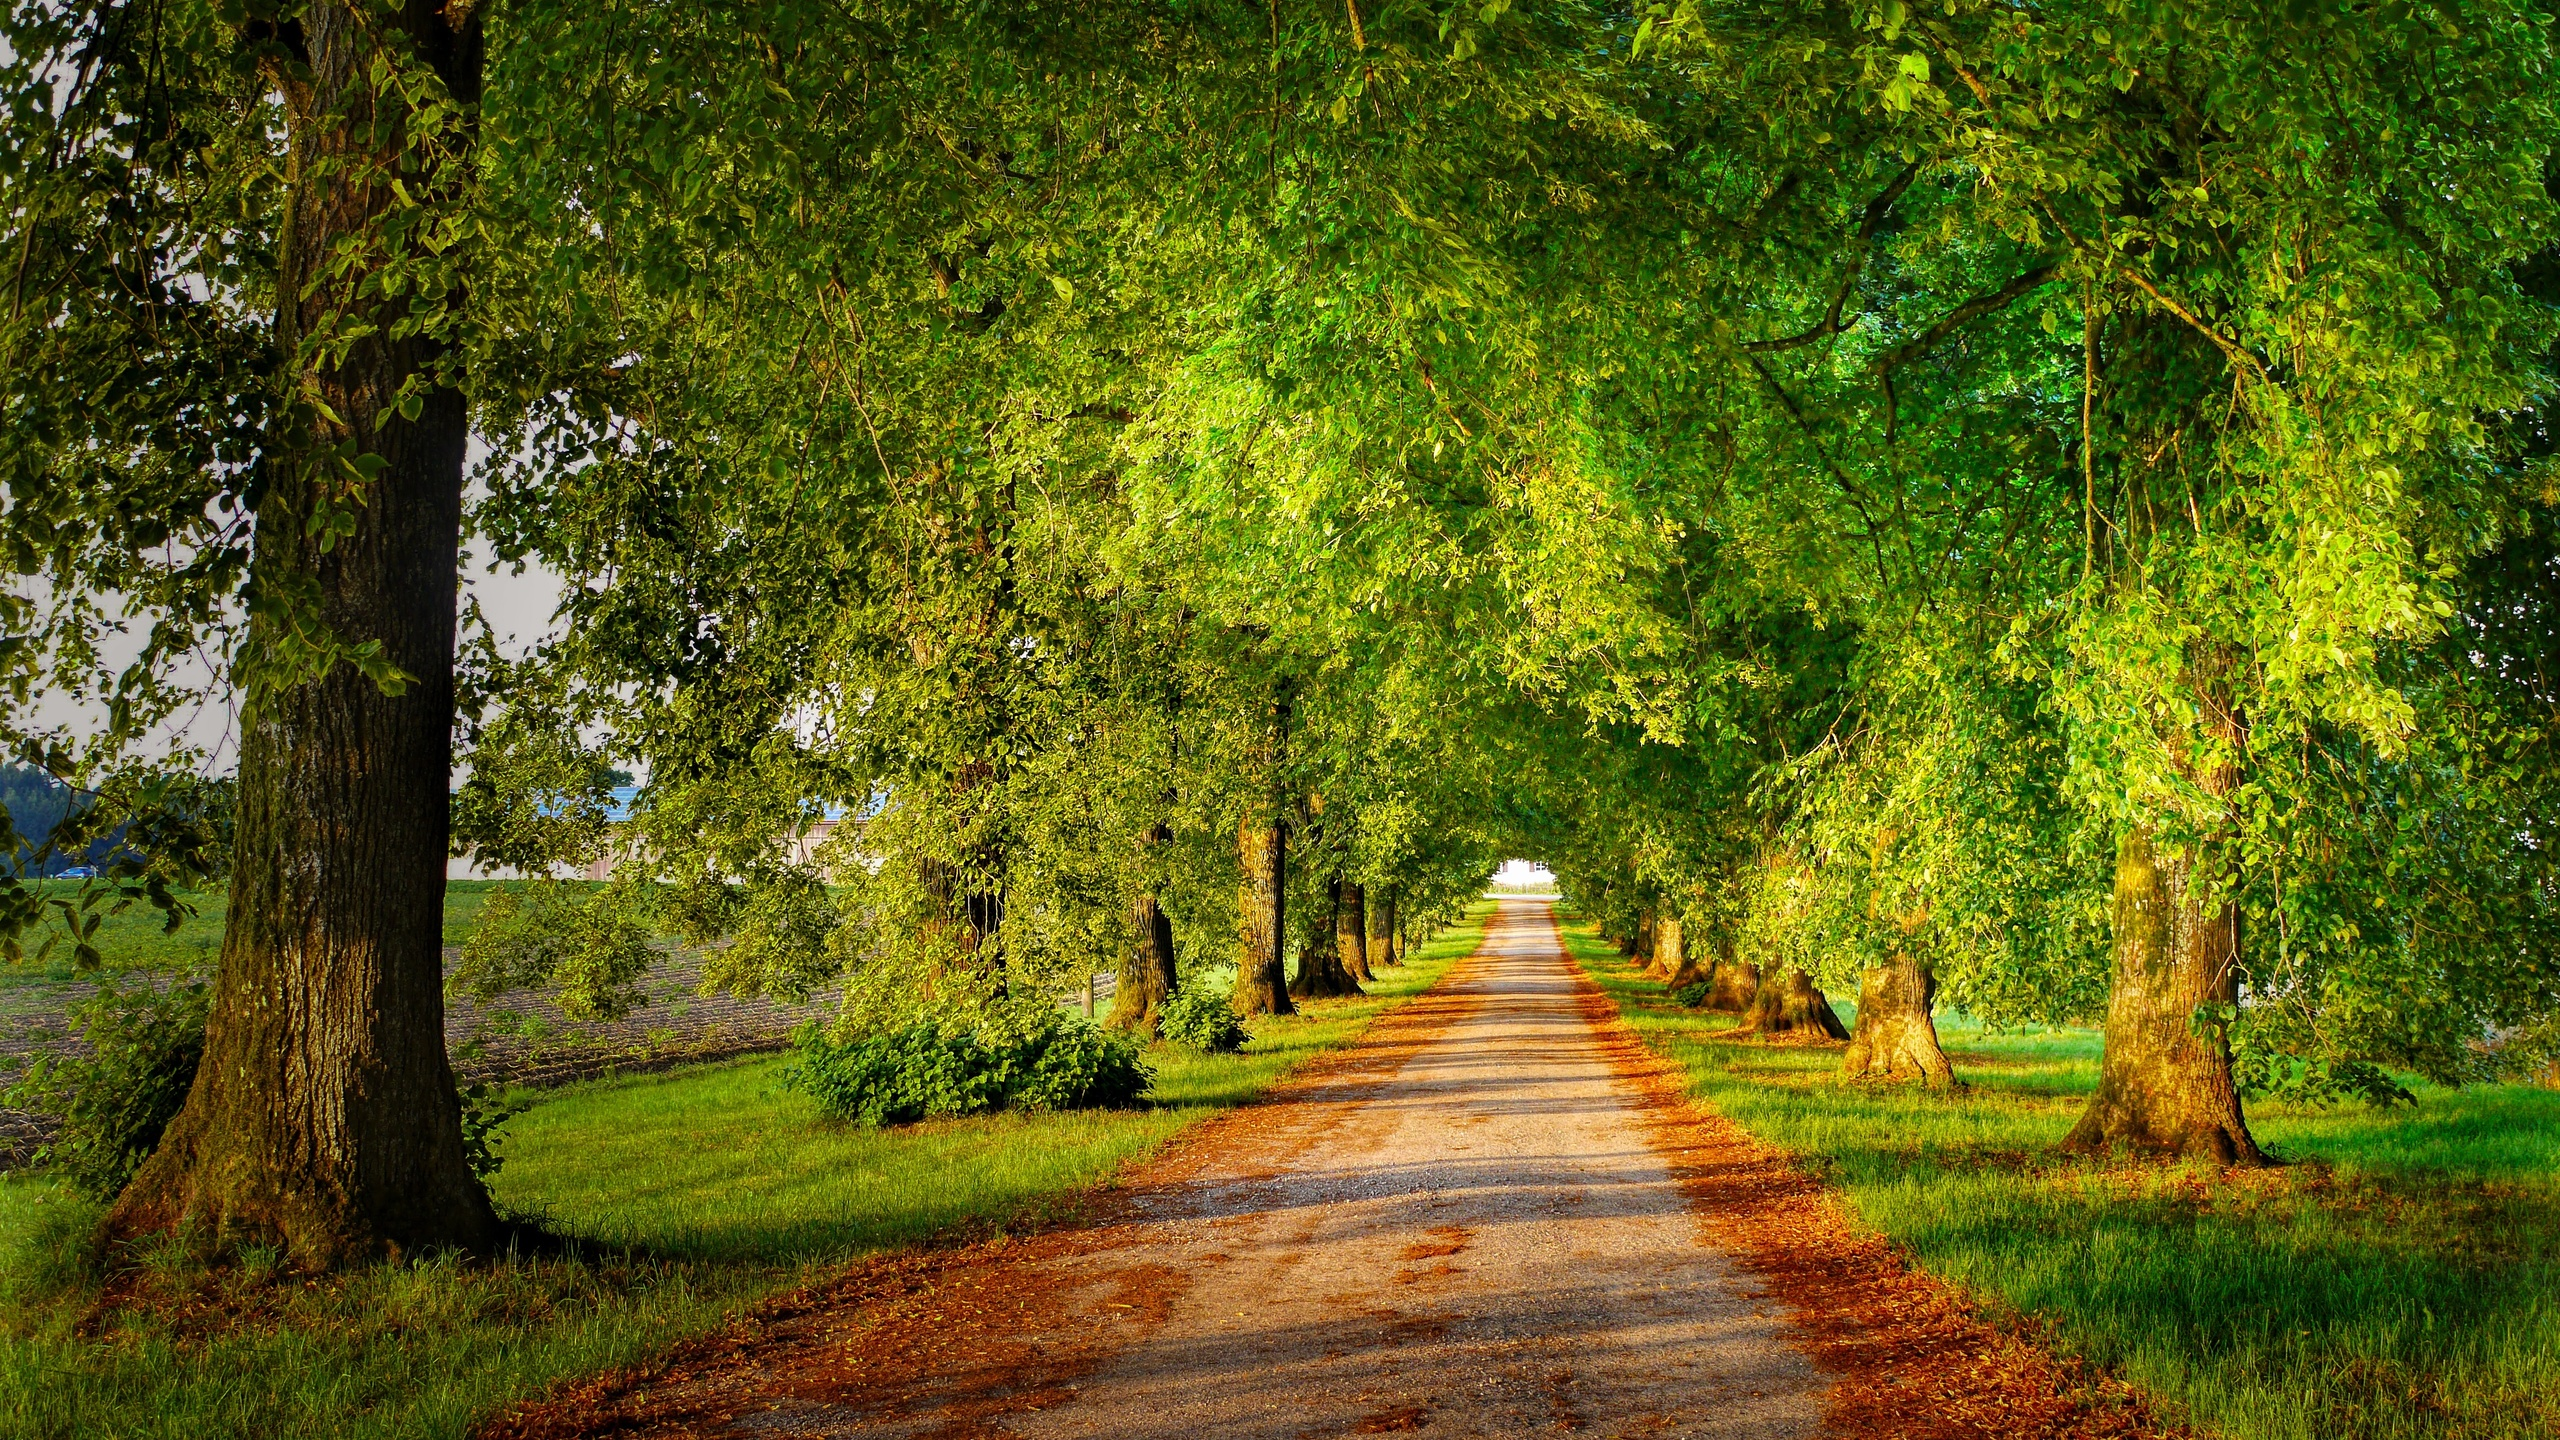 аллея, лето, пейзаж, дорога, деревья